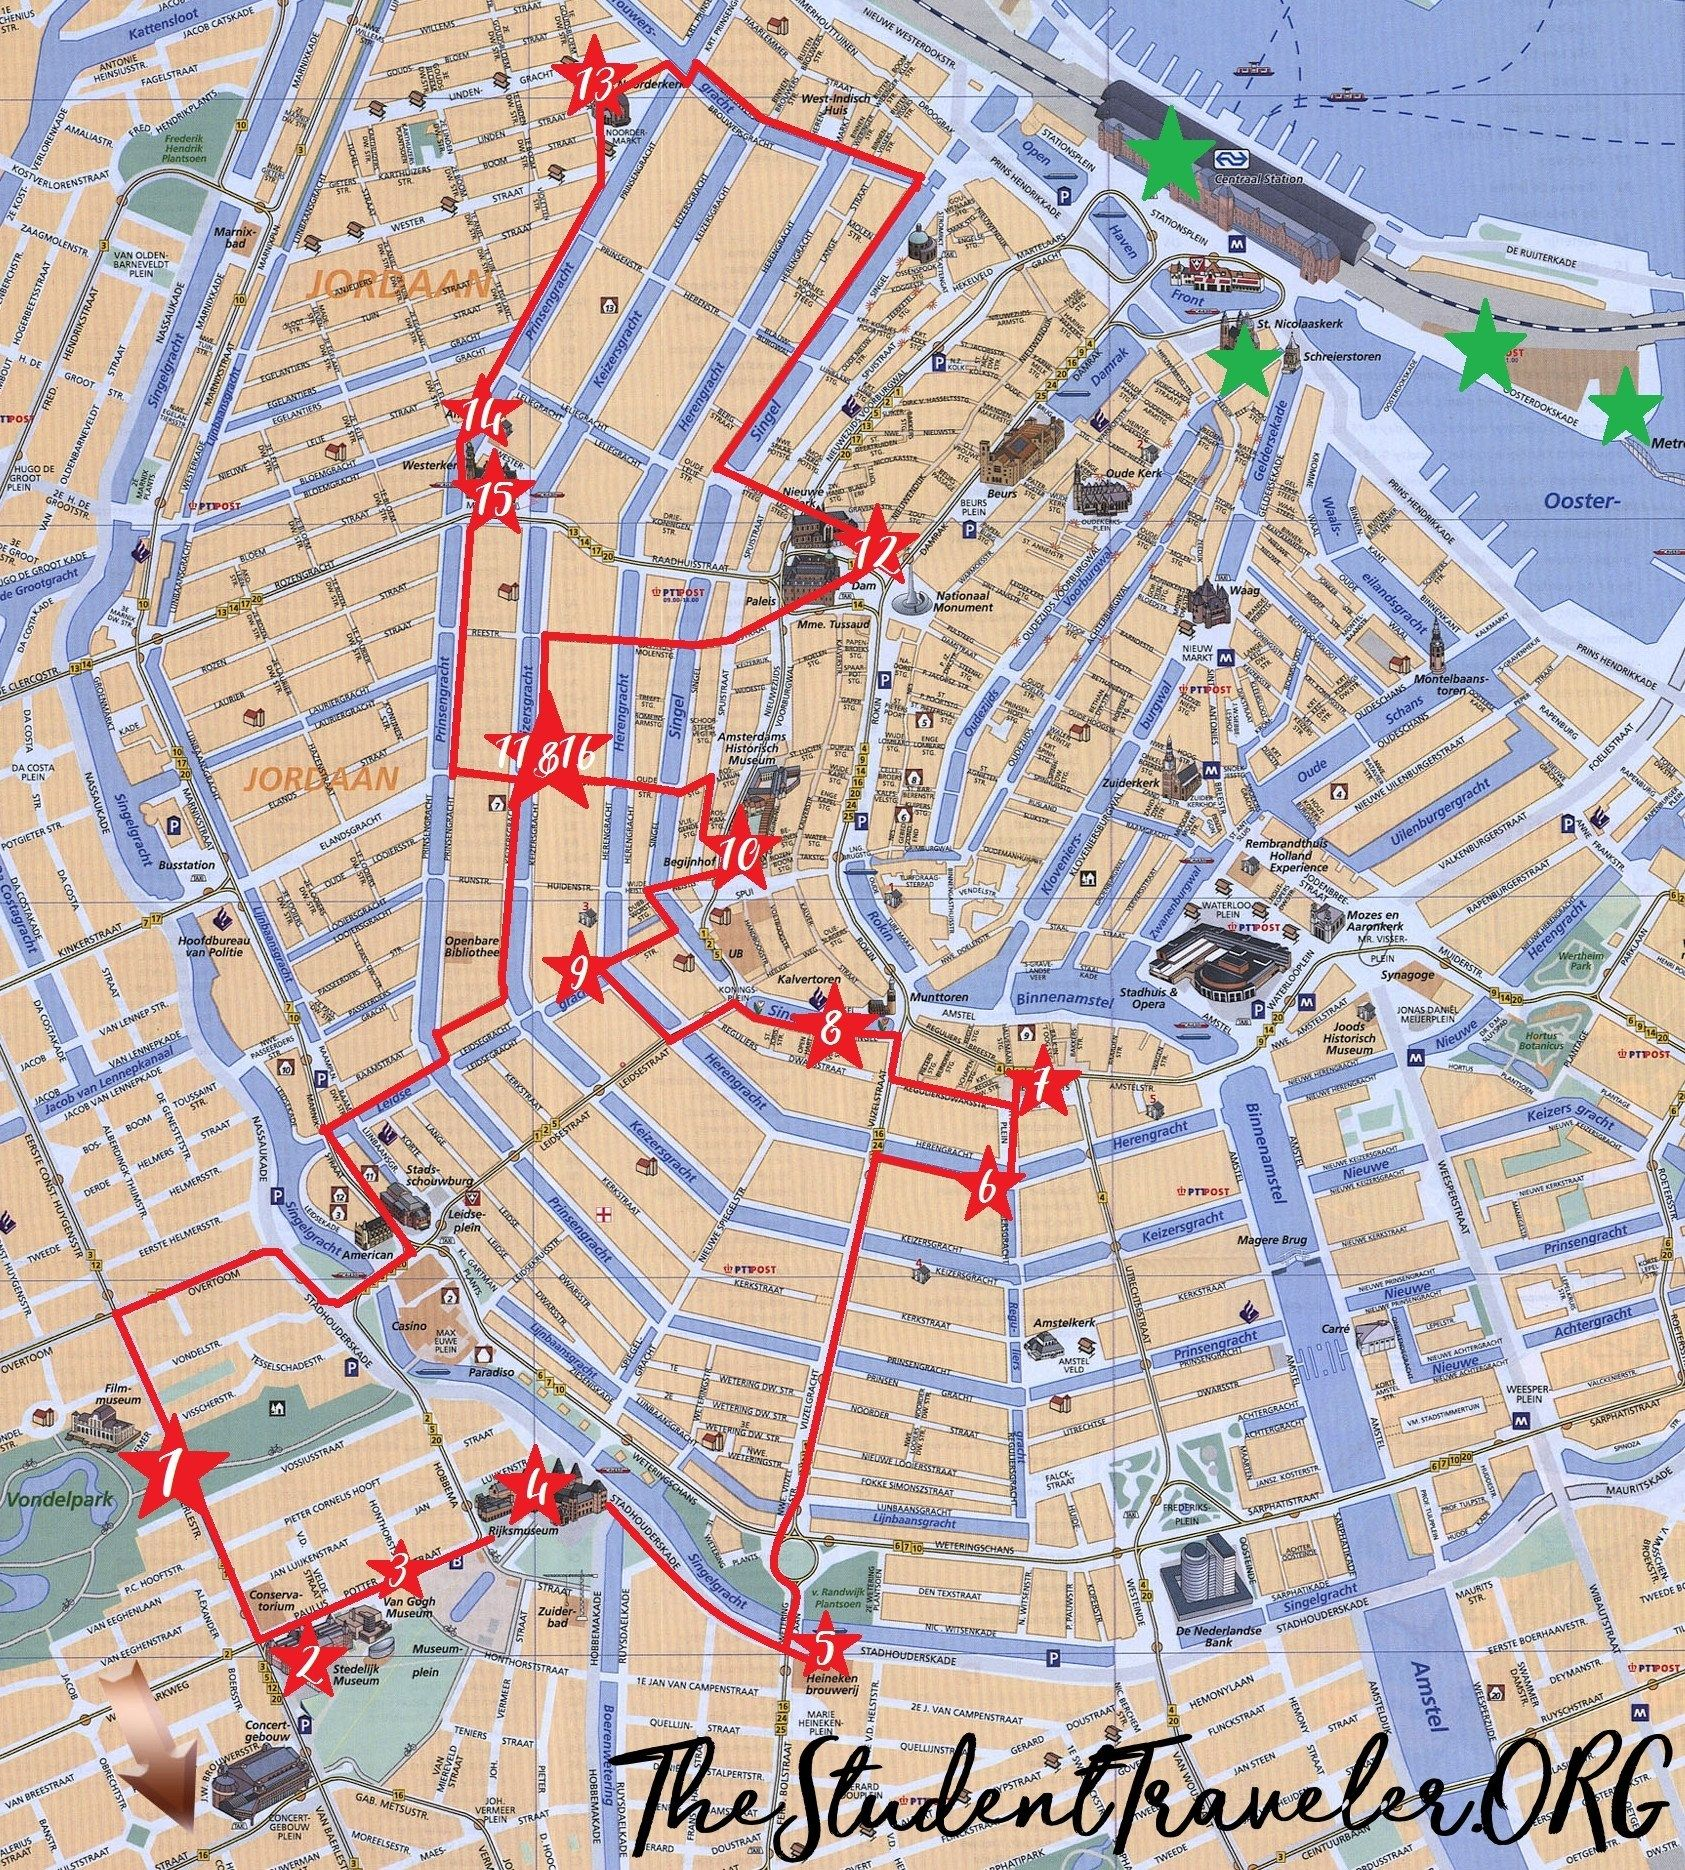 The Ultimate Self Guided Walking Tour Of Amsterdam The Student Traveler Amsterdam Reise Amsterdam Urlaub Amsterdam Tour